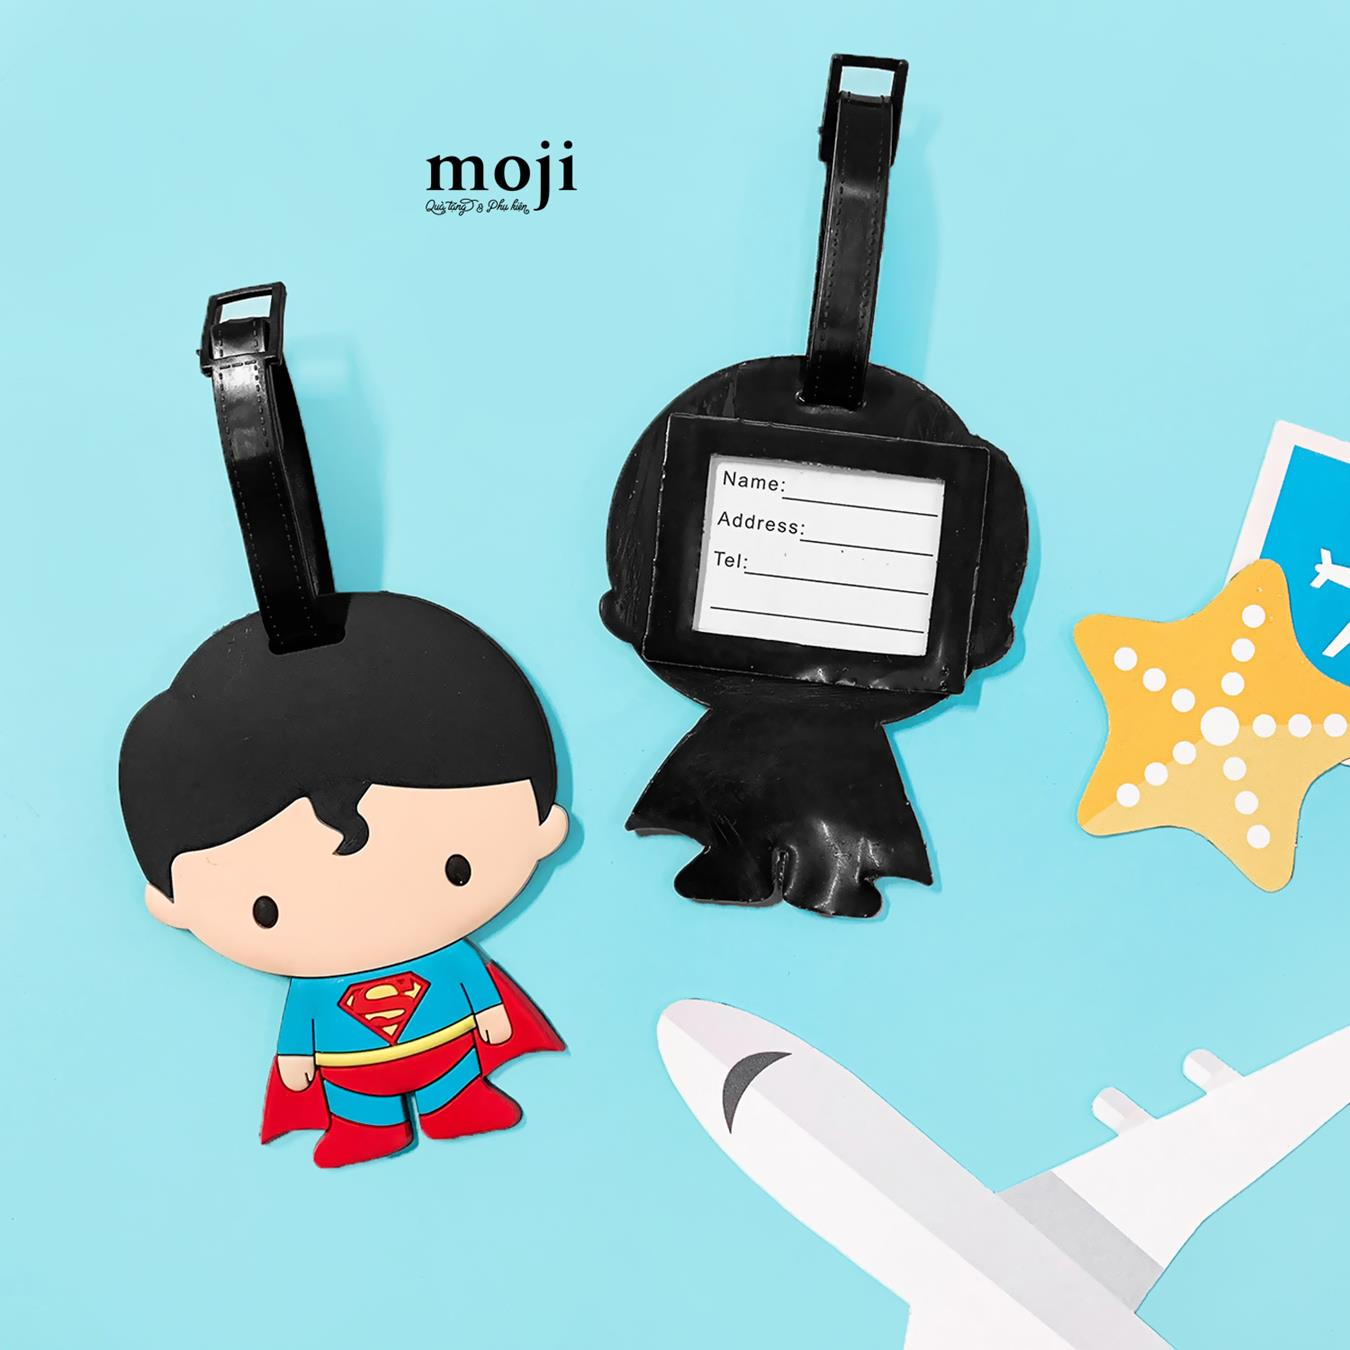 https://storage.googleapis.com/cdn.nhanh.vn/store/7534/psCT/20190504/13673515/Luggage_tag_sieu_nhan_Superman_Baby_(19051013_xx).jpg